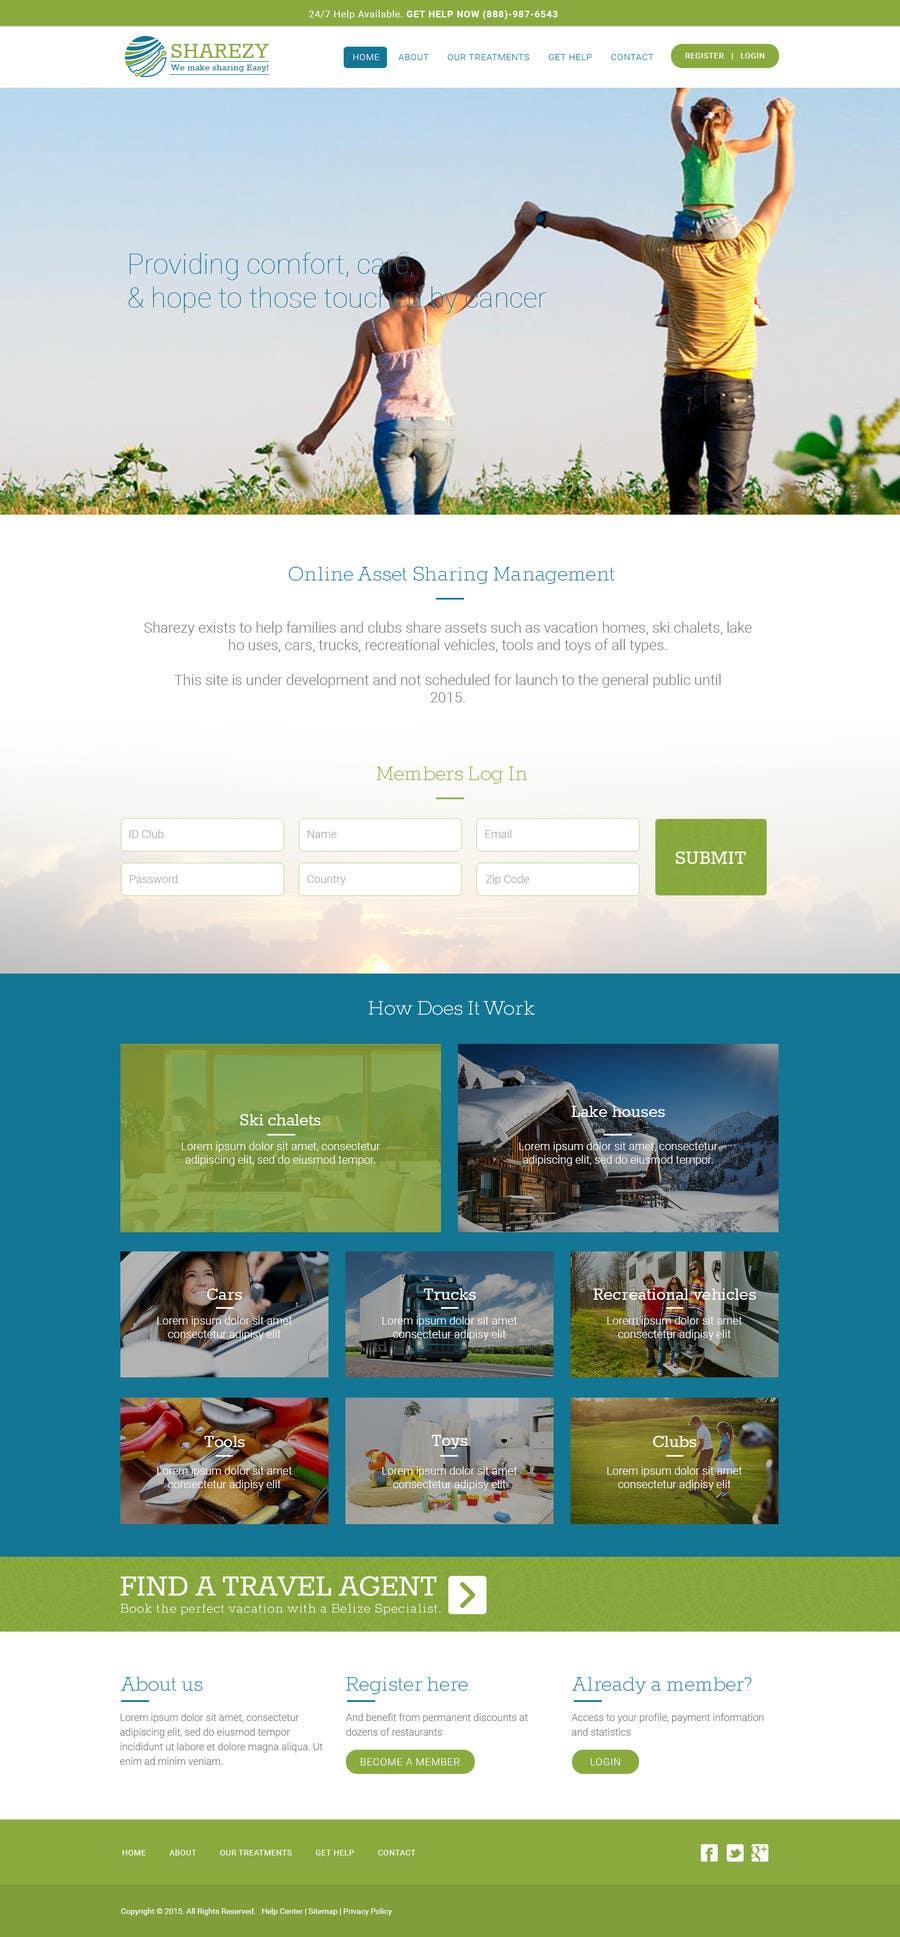 Penyertaan Peraduan #12 untuk Design a Website and Logo Mockup for a new Online Asset Sharing Service